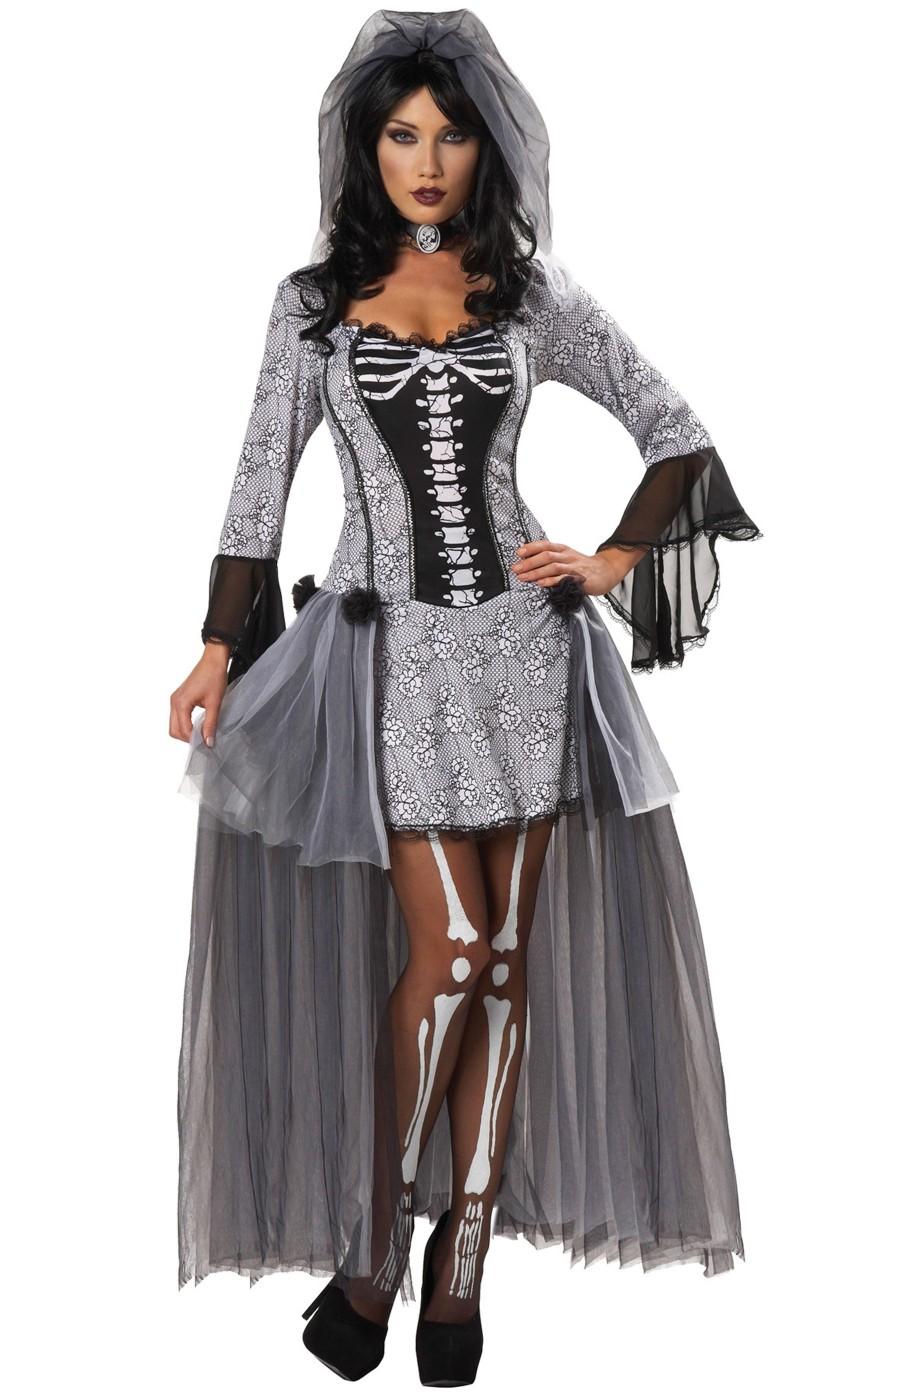 Costume Halloween donna sposa cadavere scheletro sexy 73f1b01bfebf